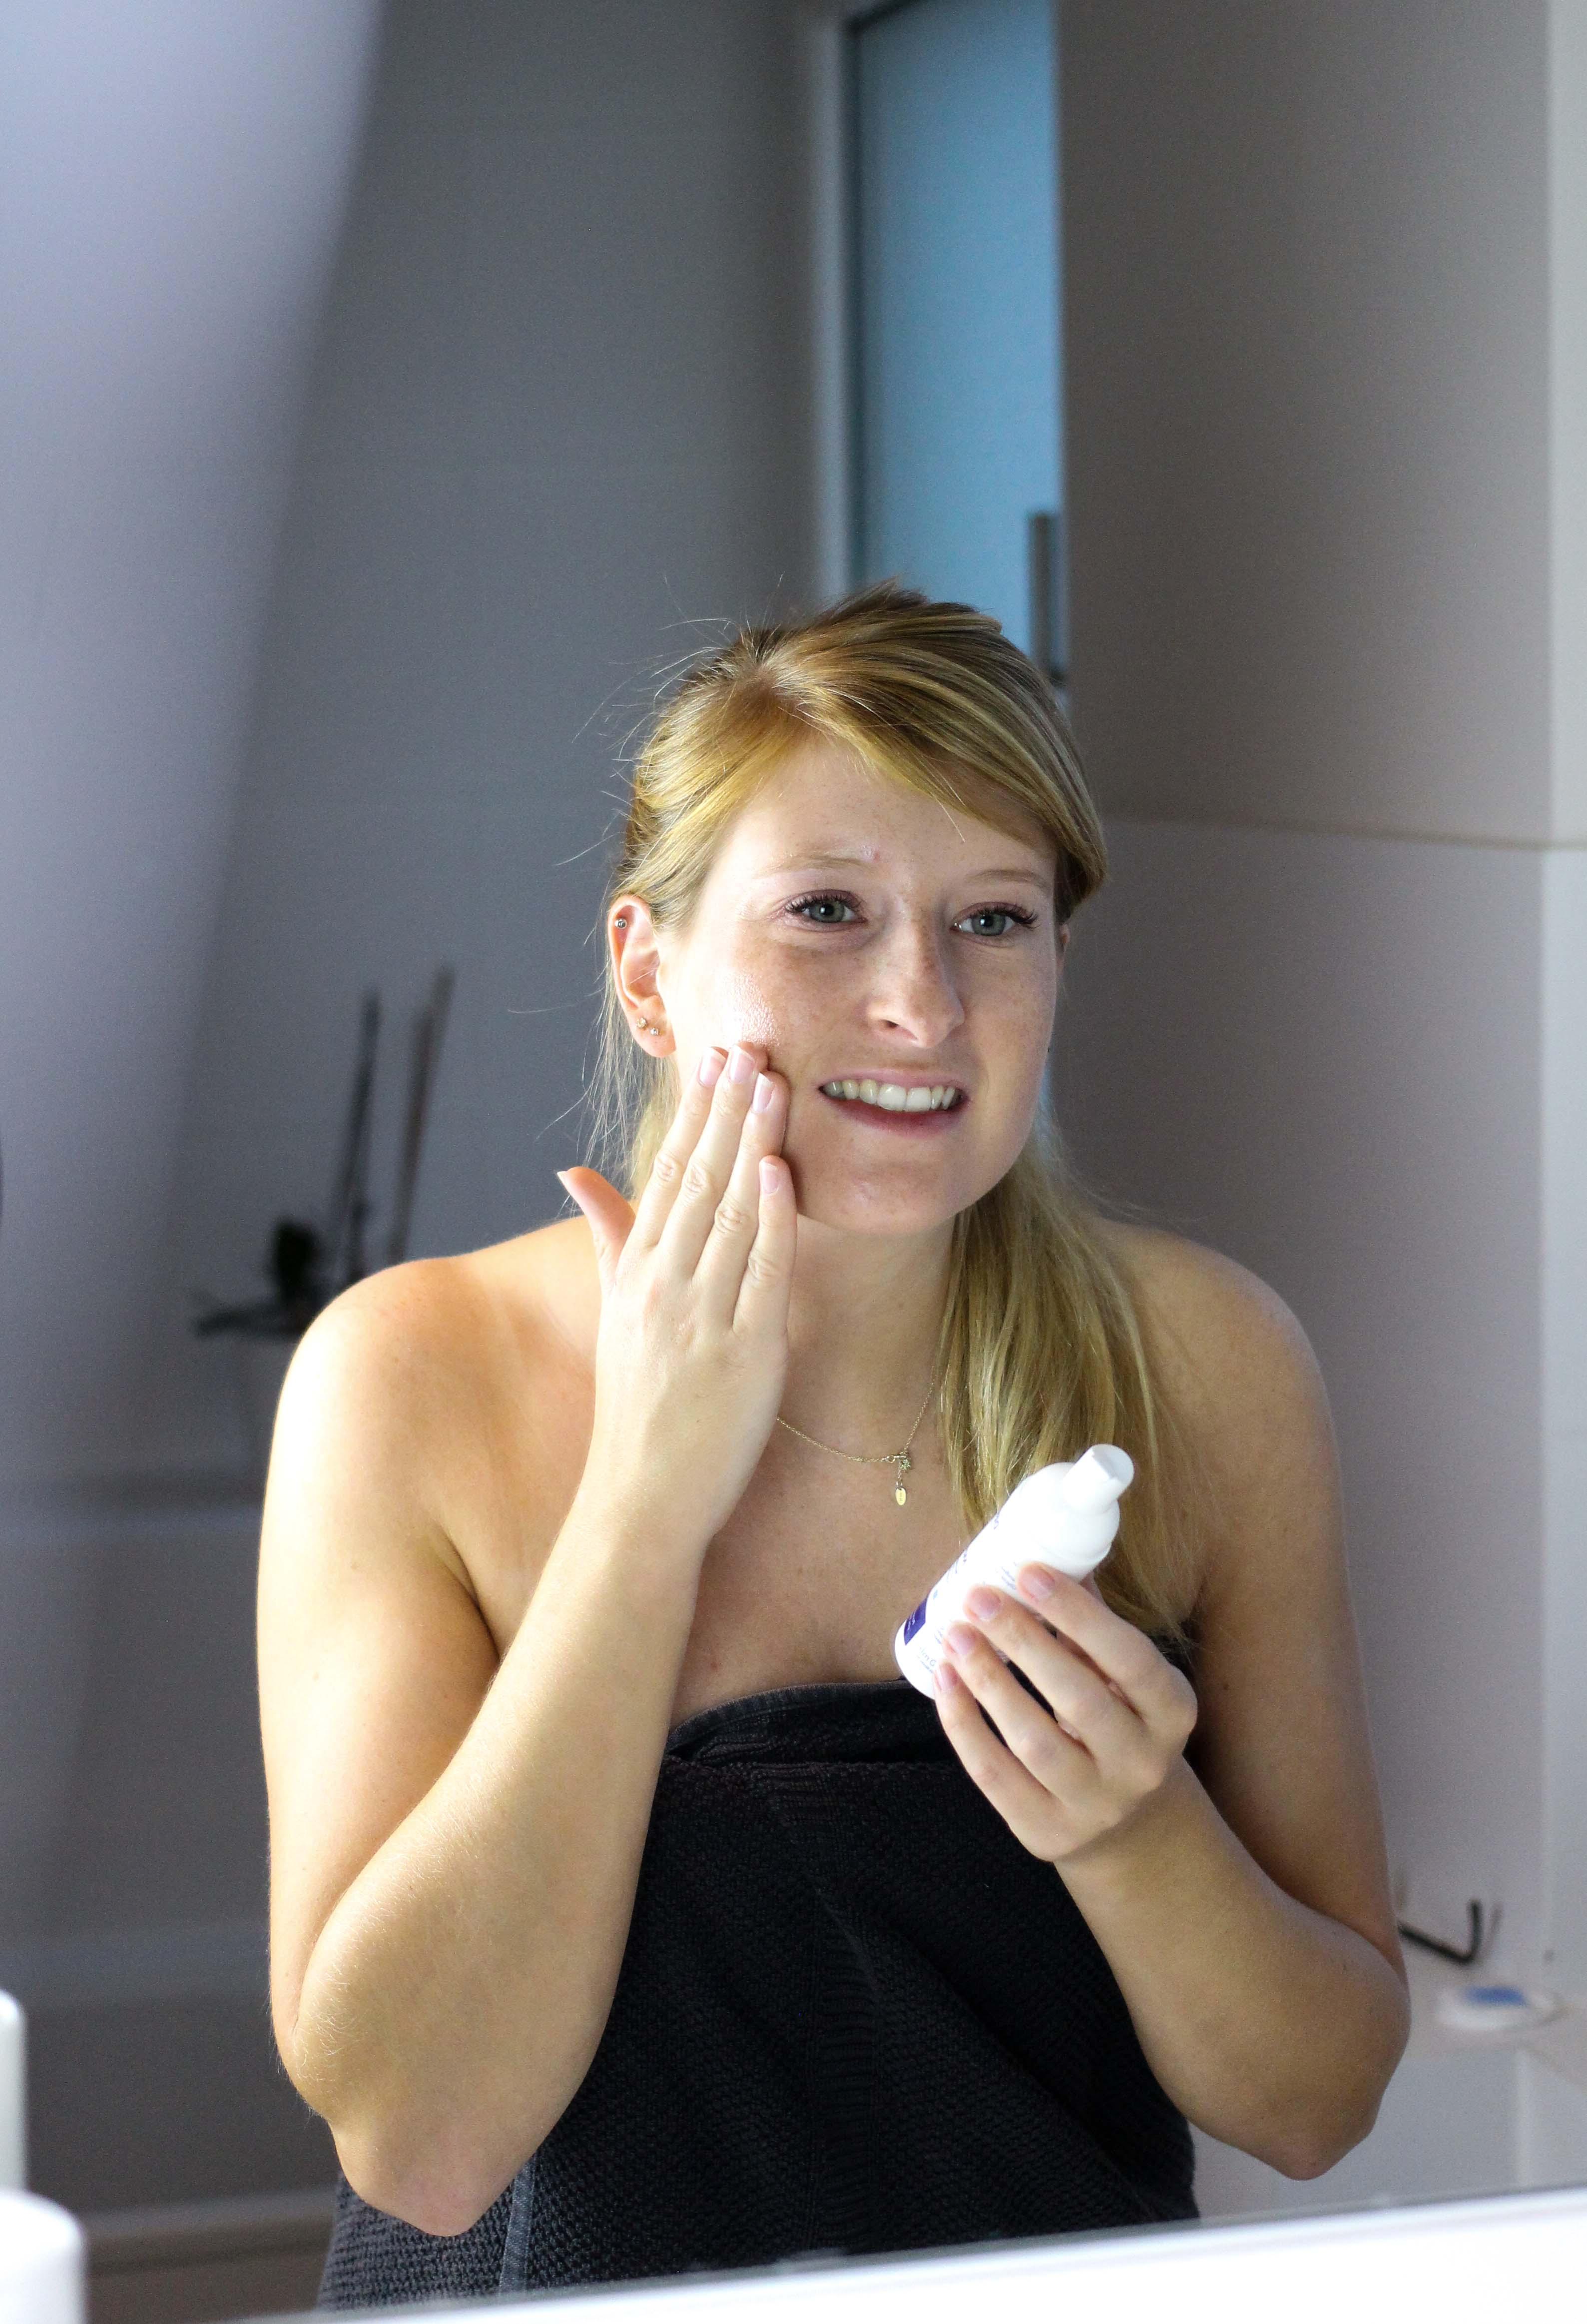 Blogger Adventskalender Gewinnspiel Dermasence Hautpflege Winter Urlaubs-Reiseset Mousse Reisegröße Beauty Blogger Tipps Anwendung 2